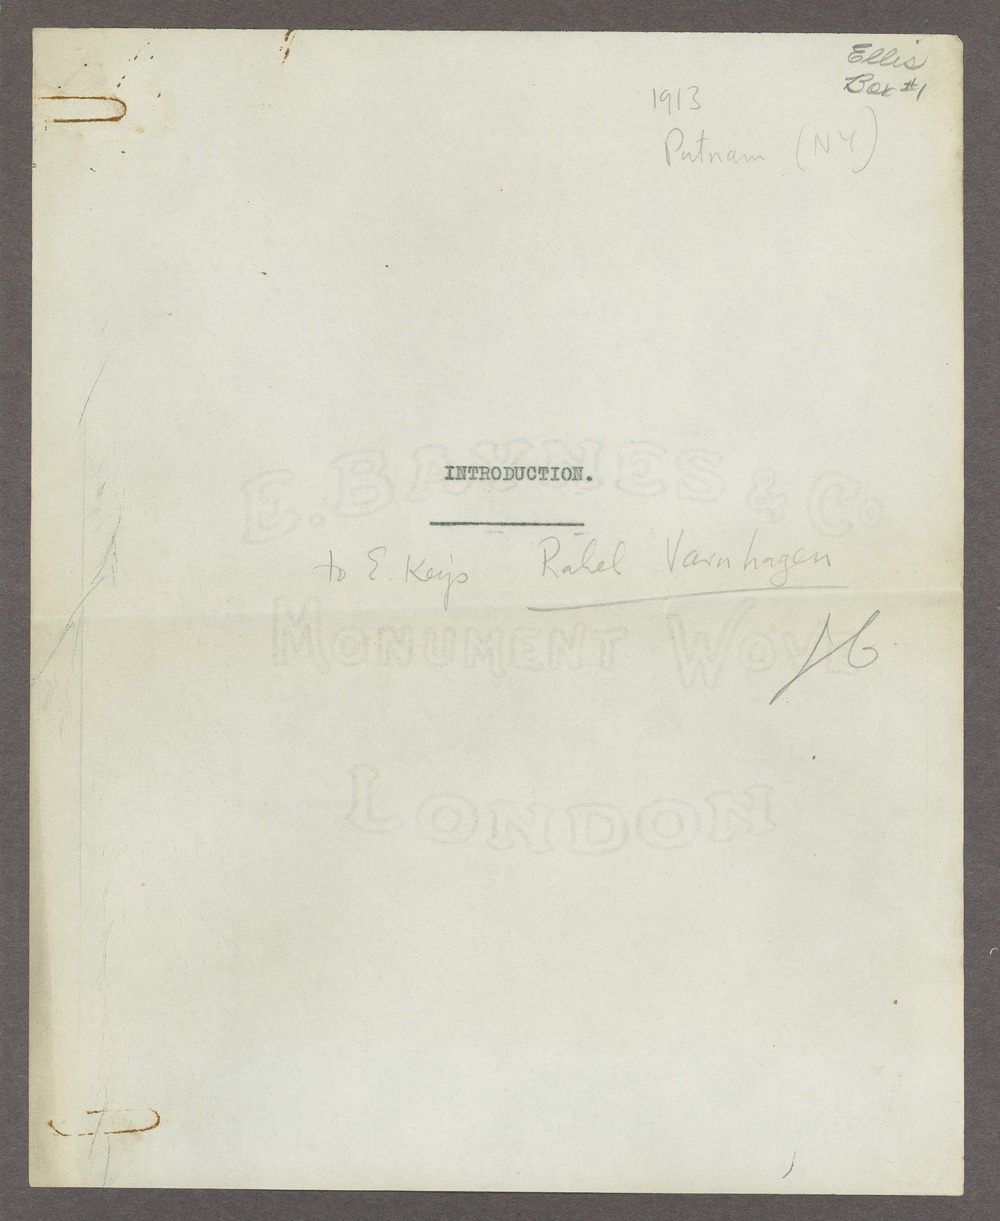 Henry Havelock Ellis papers - 1 [Box 1, Folder 3]